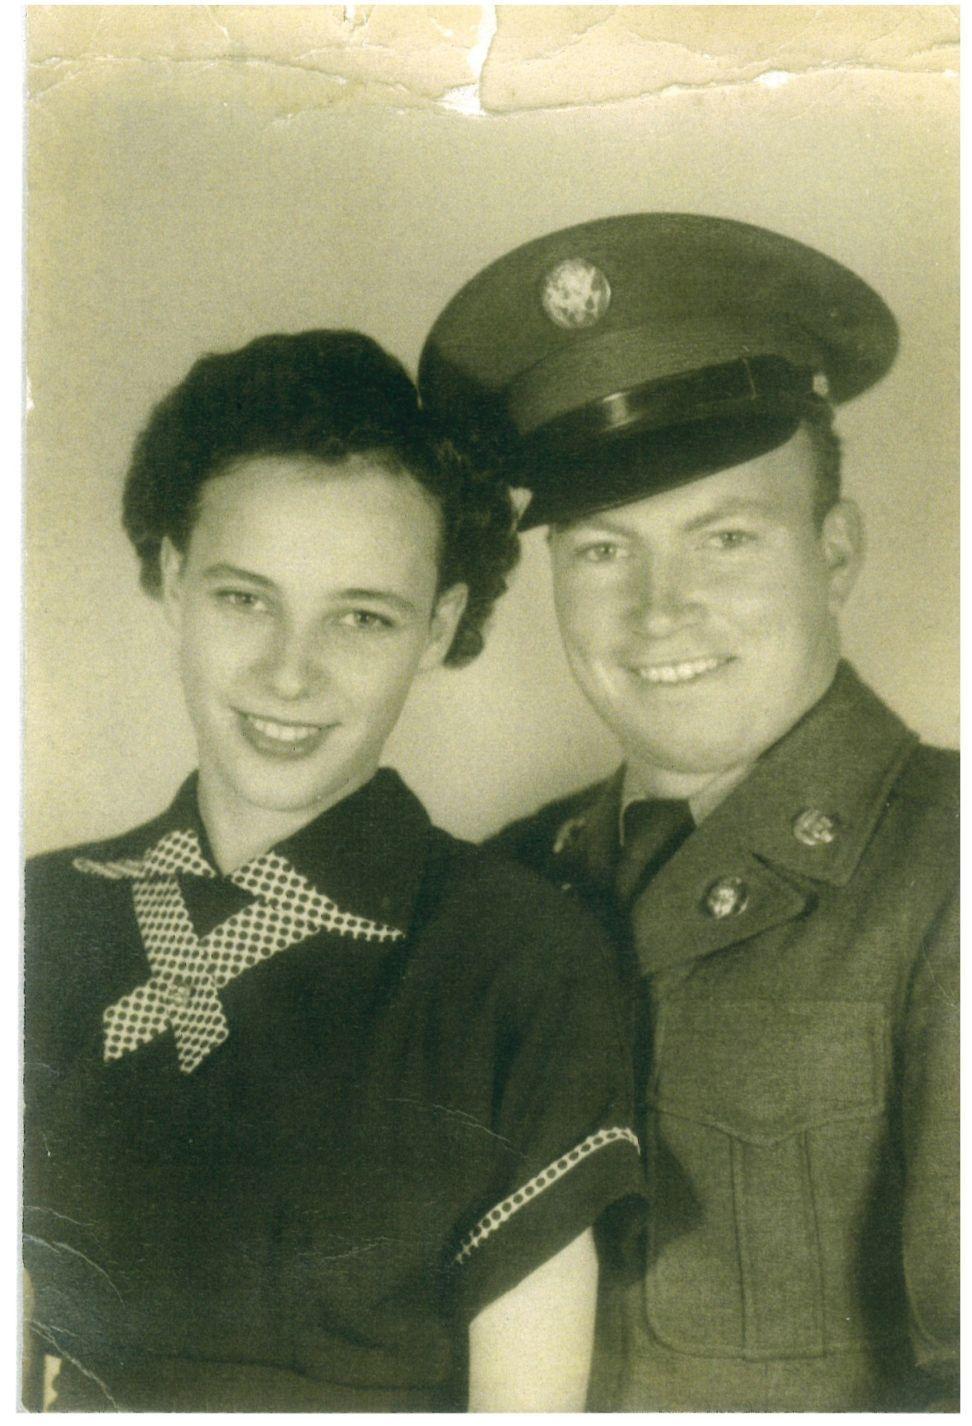 Carl and Marjorie Deardorff